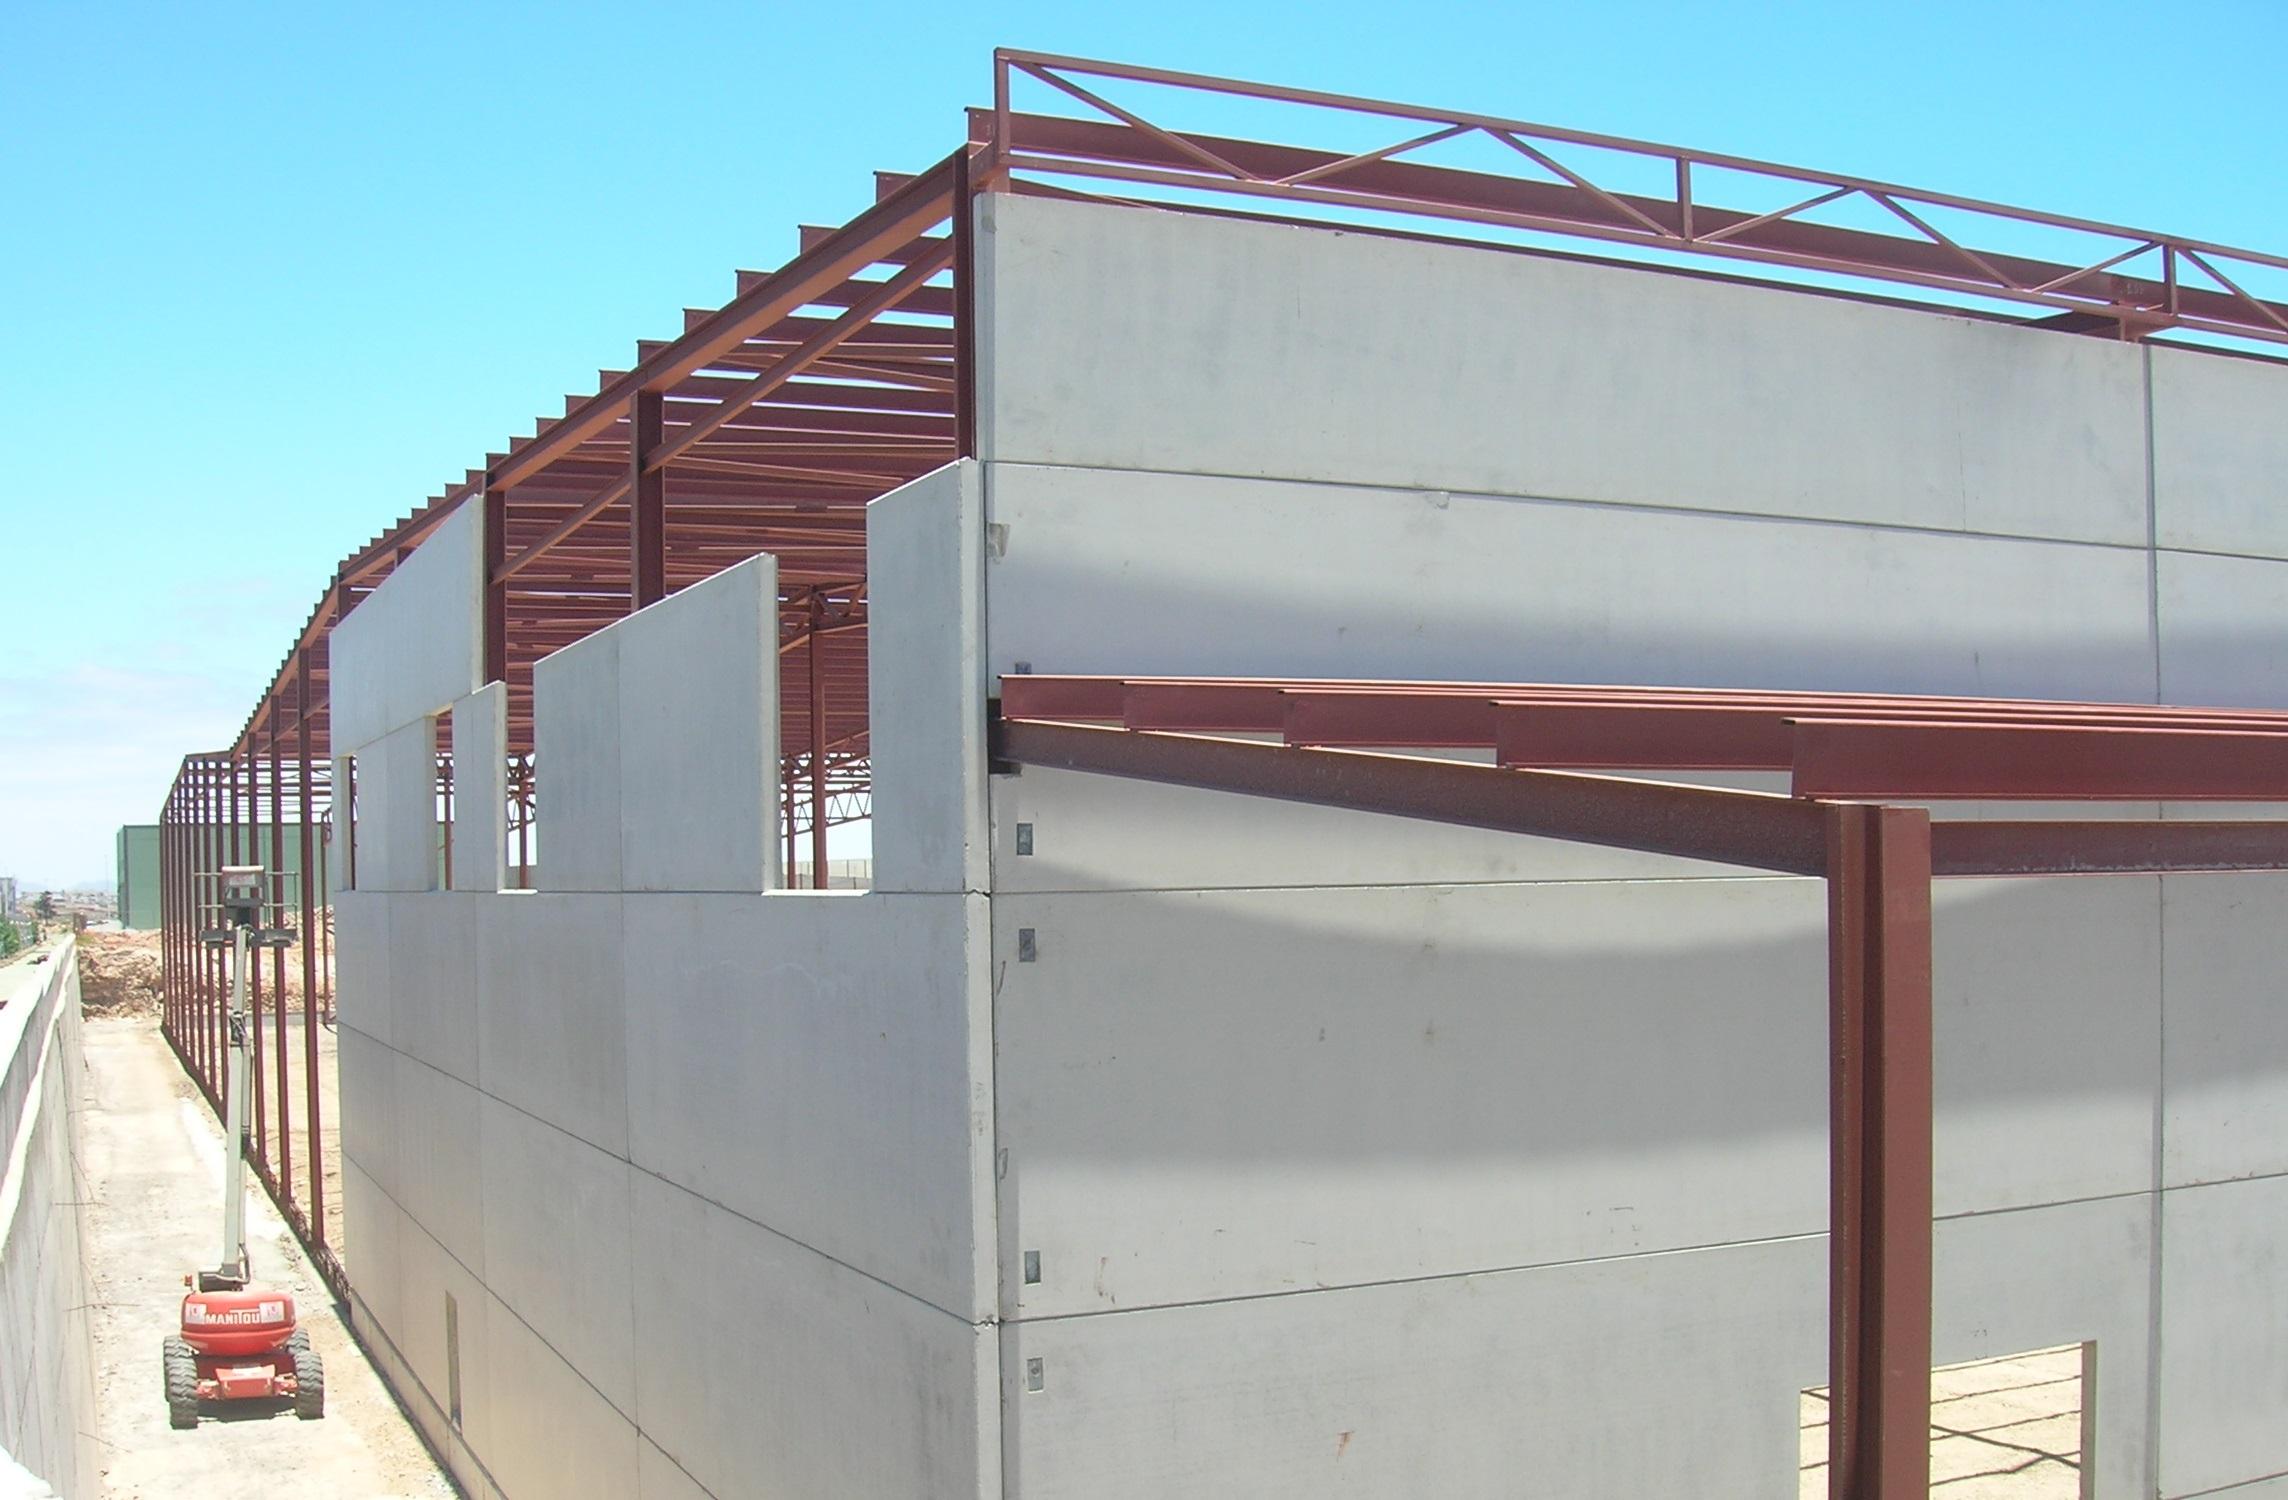 Inelsa empresa de construcci n en alicante naves for Naves prefabricadas de hormigon precios